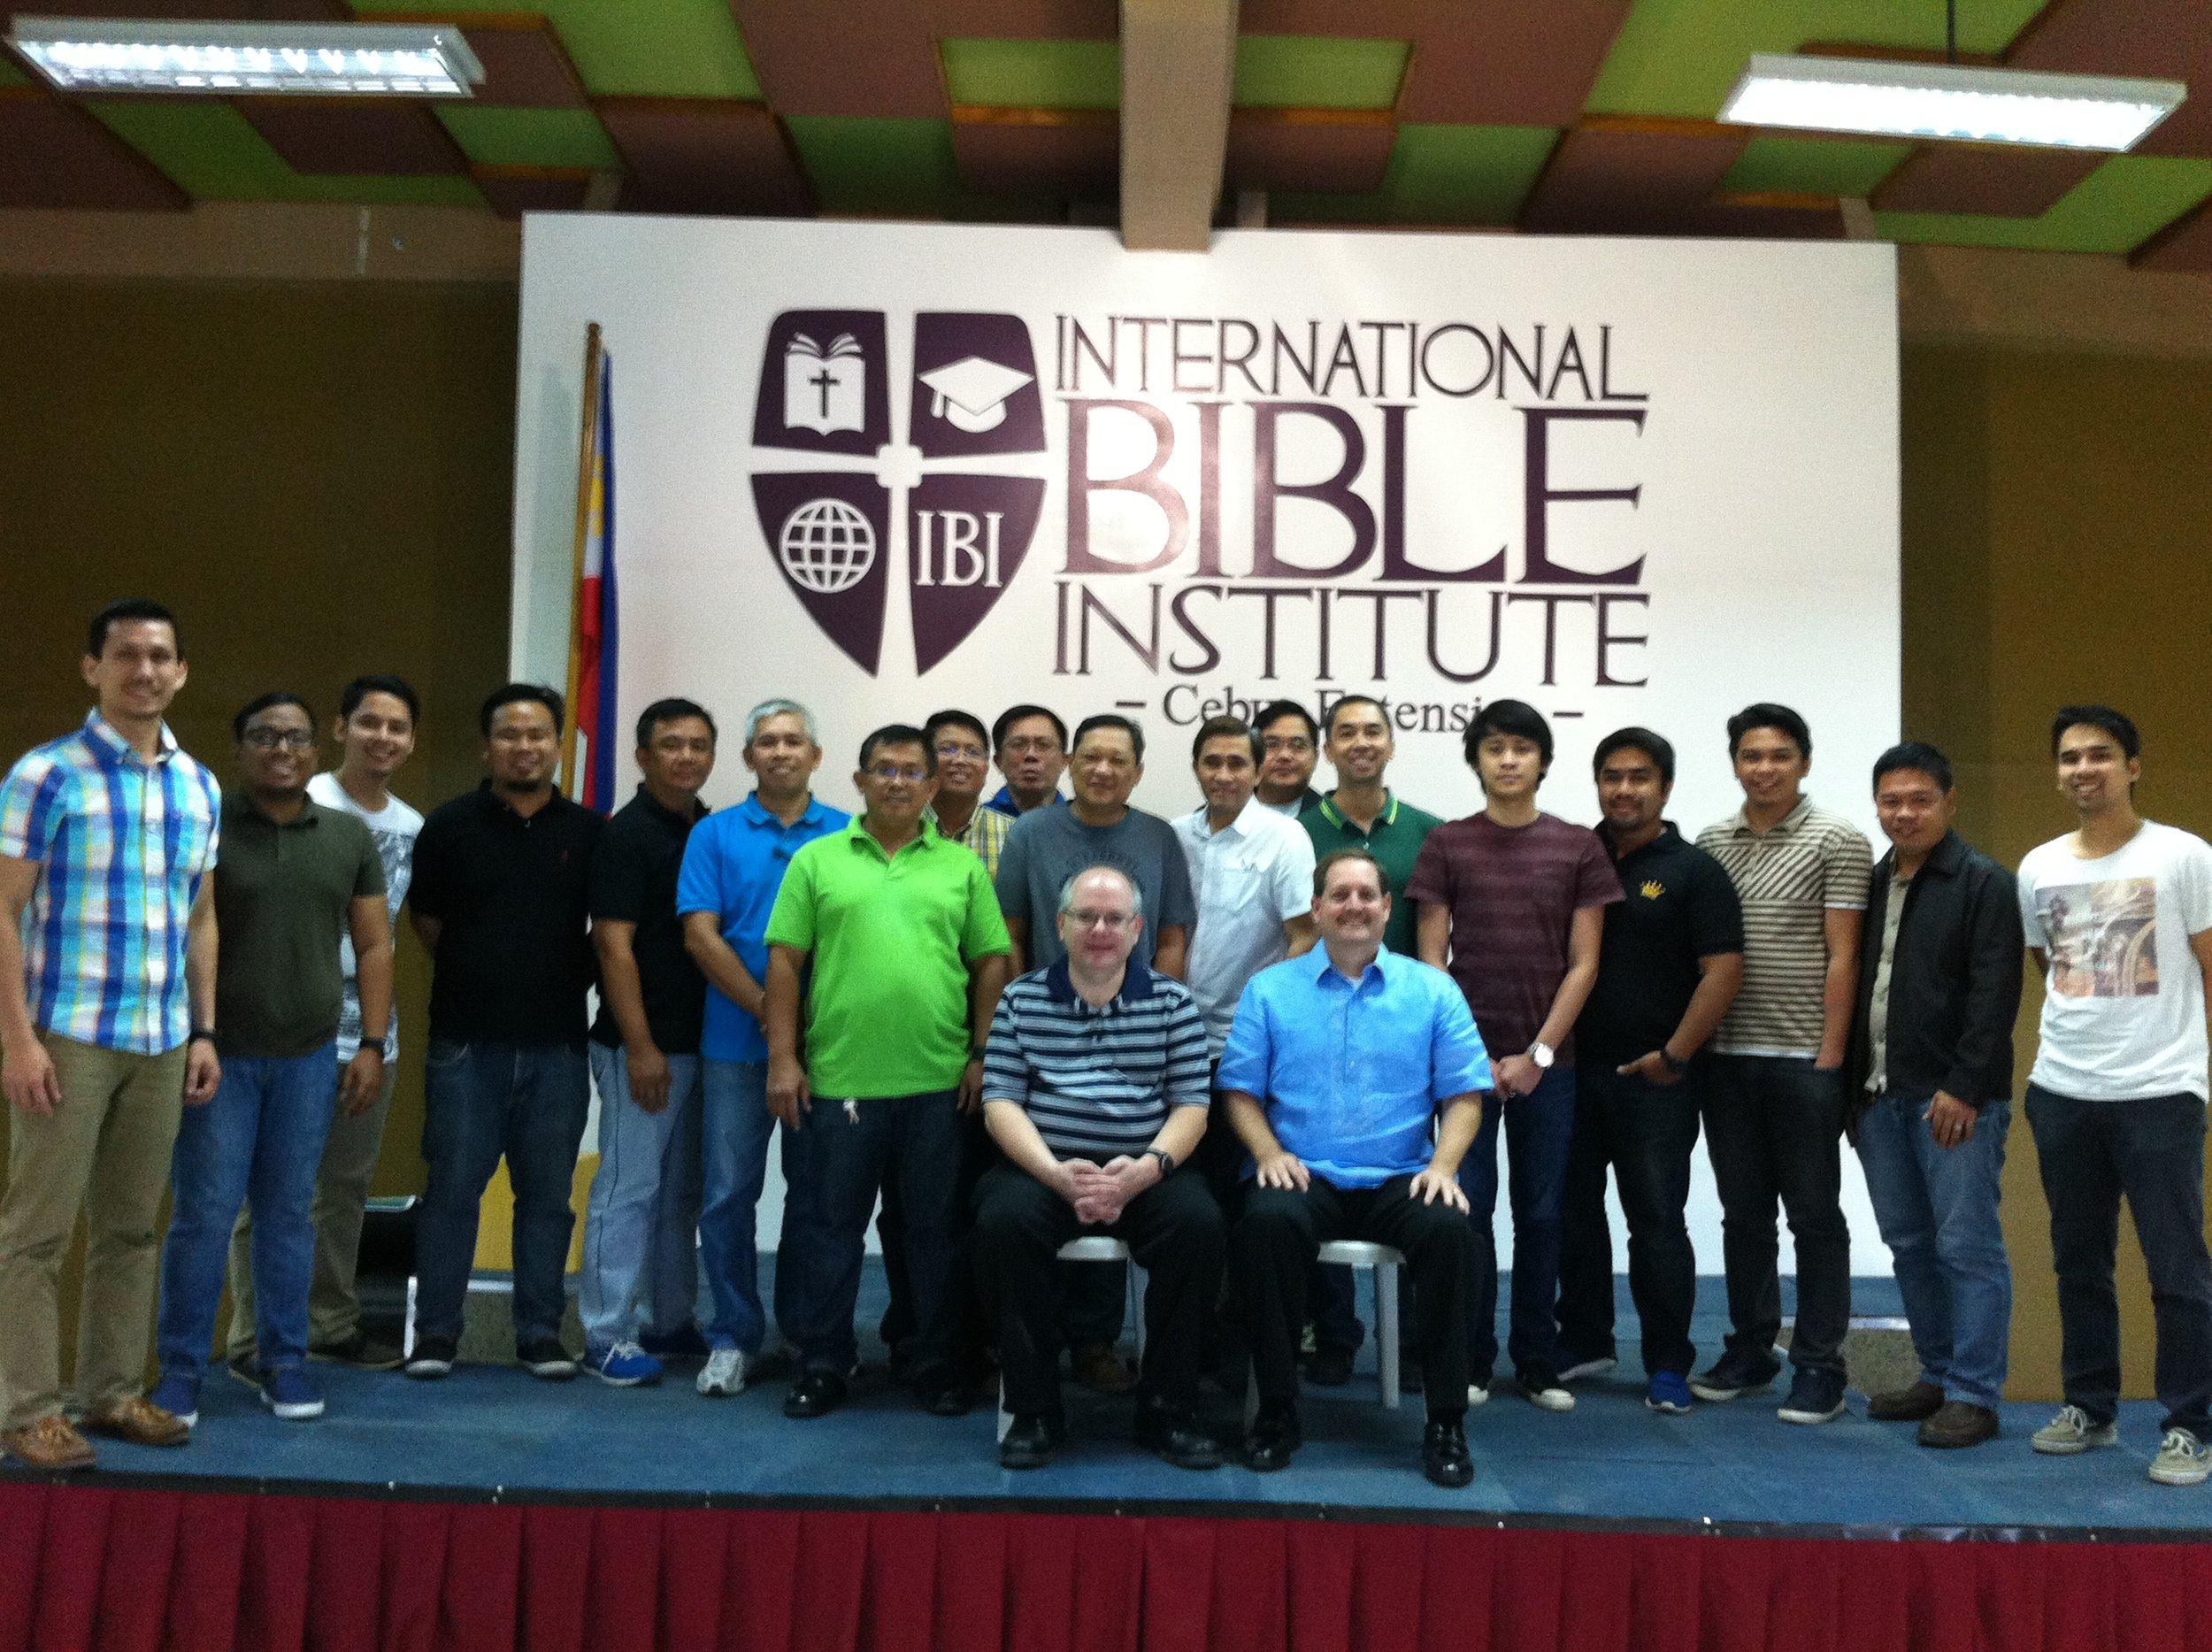 IBI pastors